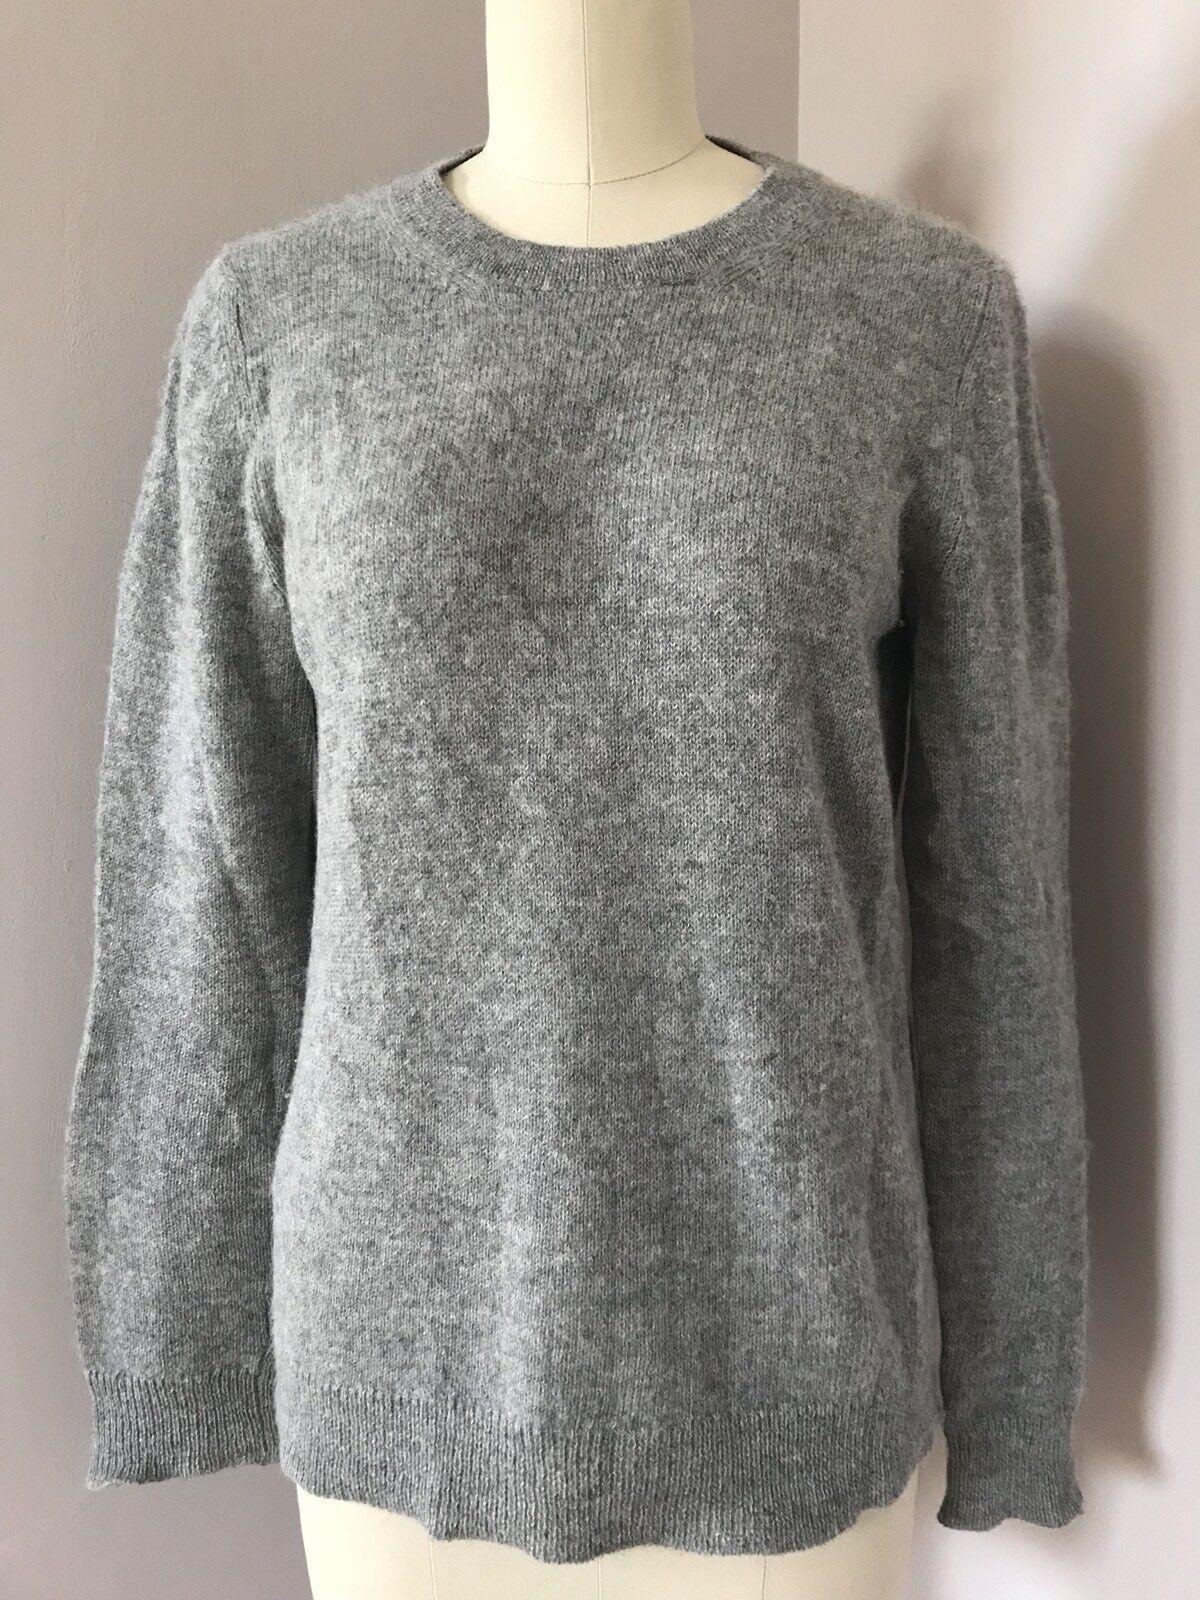 Prada Heather Grey 100% Alpaca Wool Knit Long Sleeve Sweater Size 44